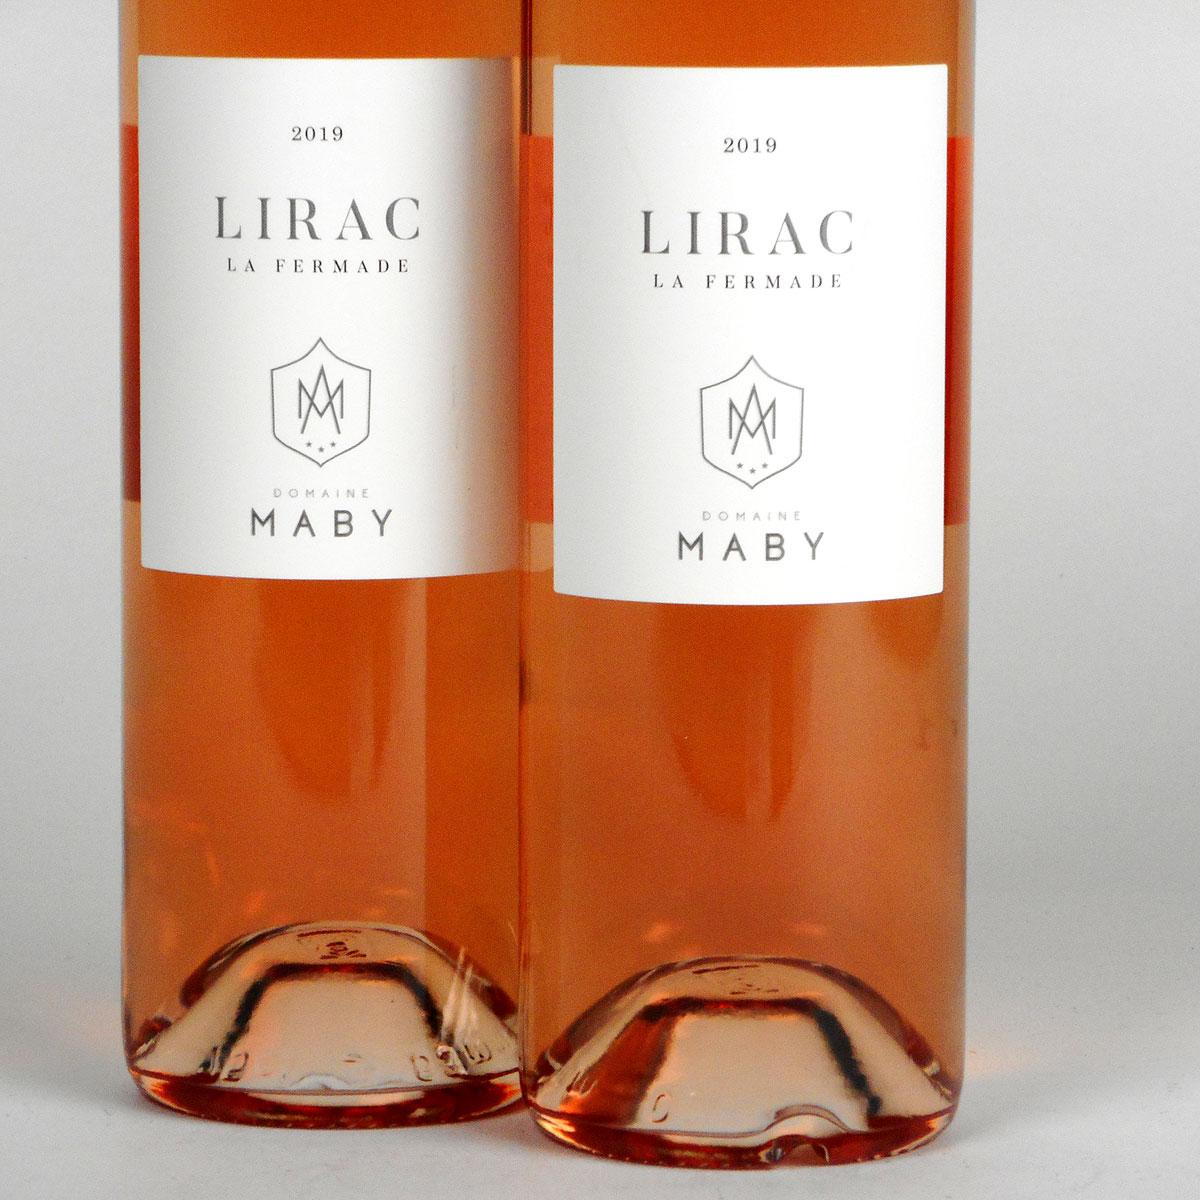 Lirac: Domaine Maby 'La Fermade' Rosé 2019